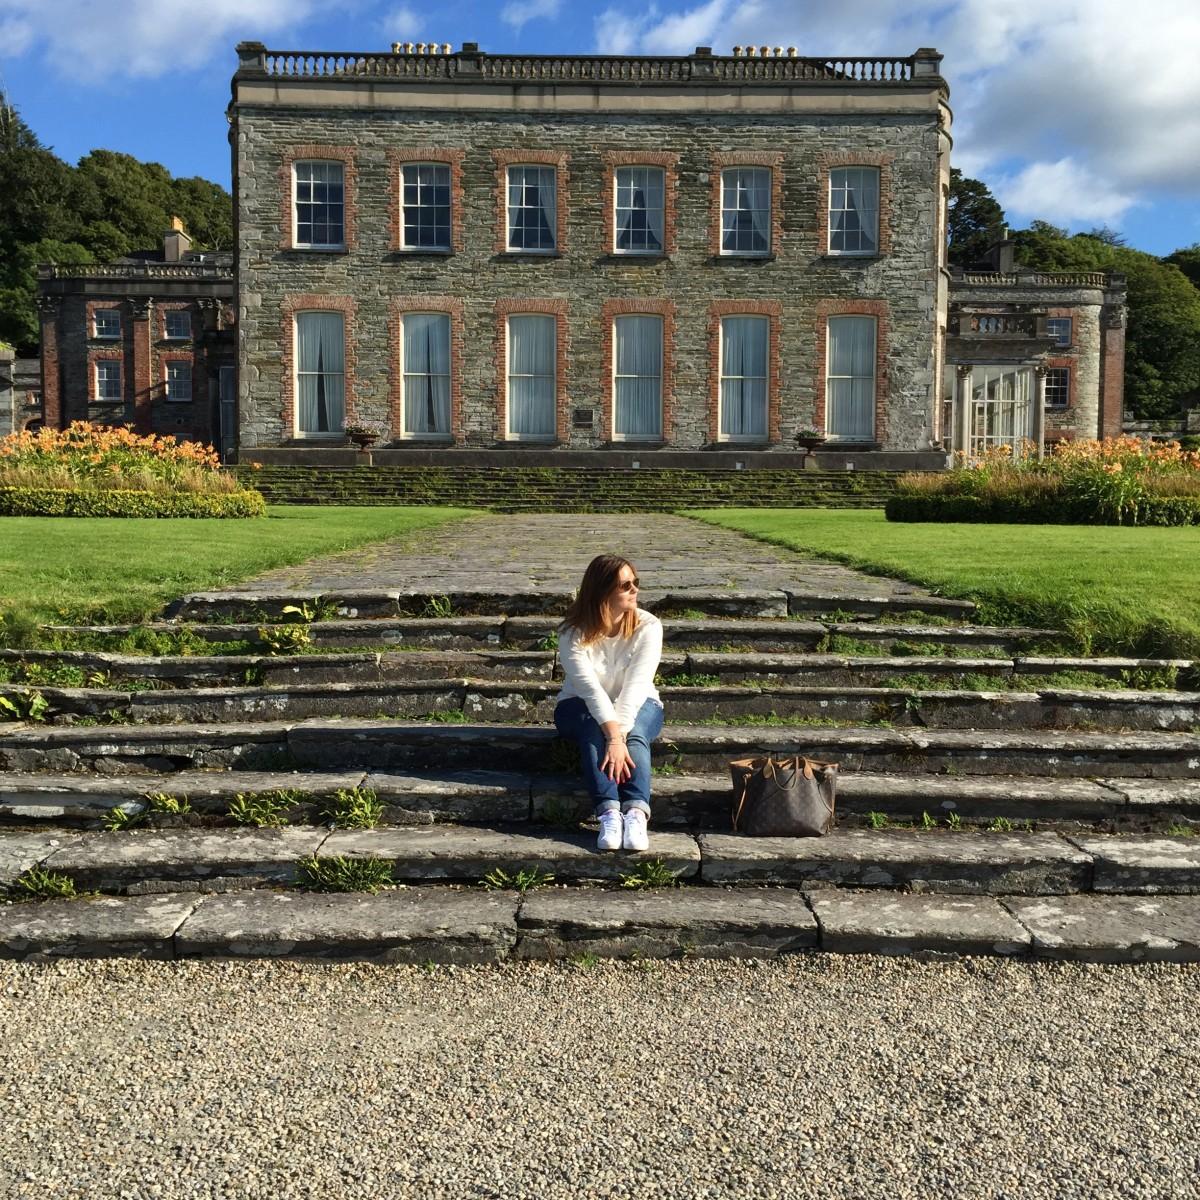 bantry house in Irlanda